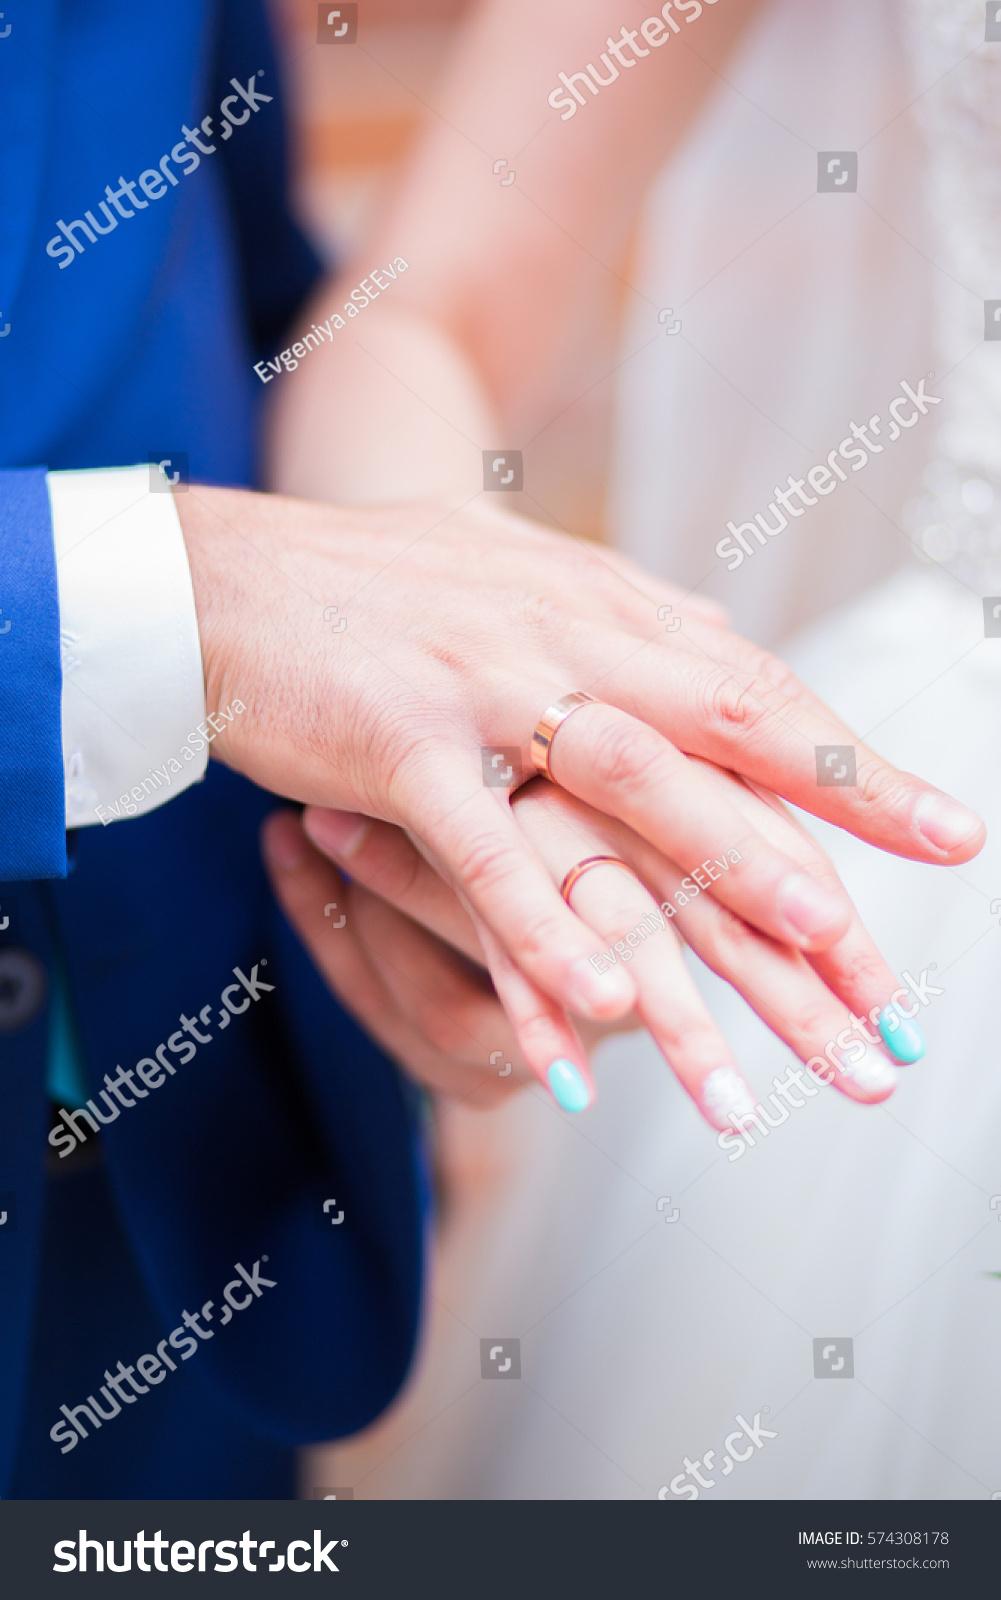 Wedding Rings Hands Stock Photo 574308178 - Shutterstock